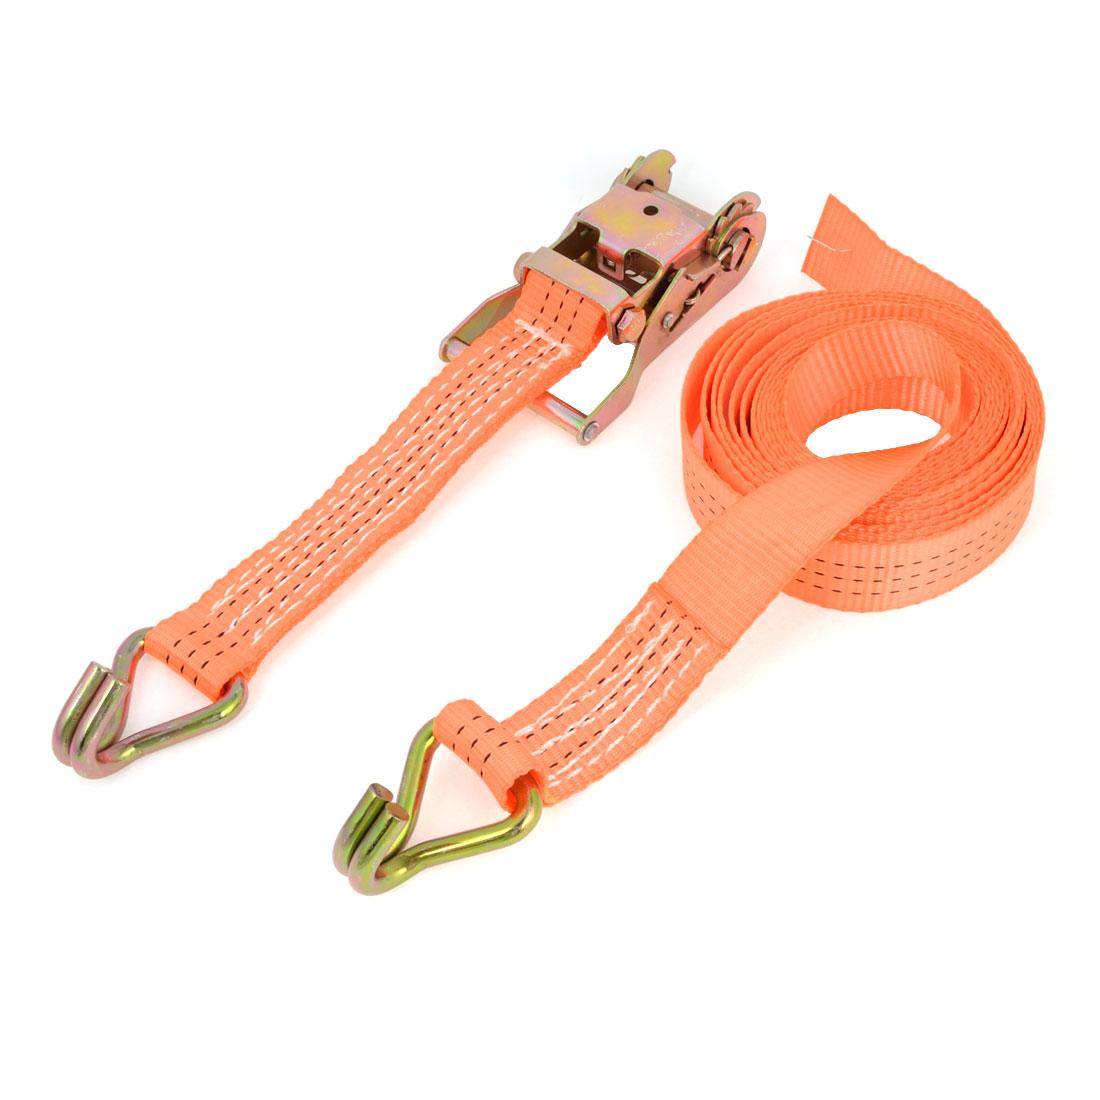 Truck Dual Metal Hook Polyester Luggage Rope Cord 5M Long Orange